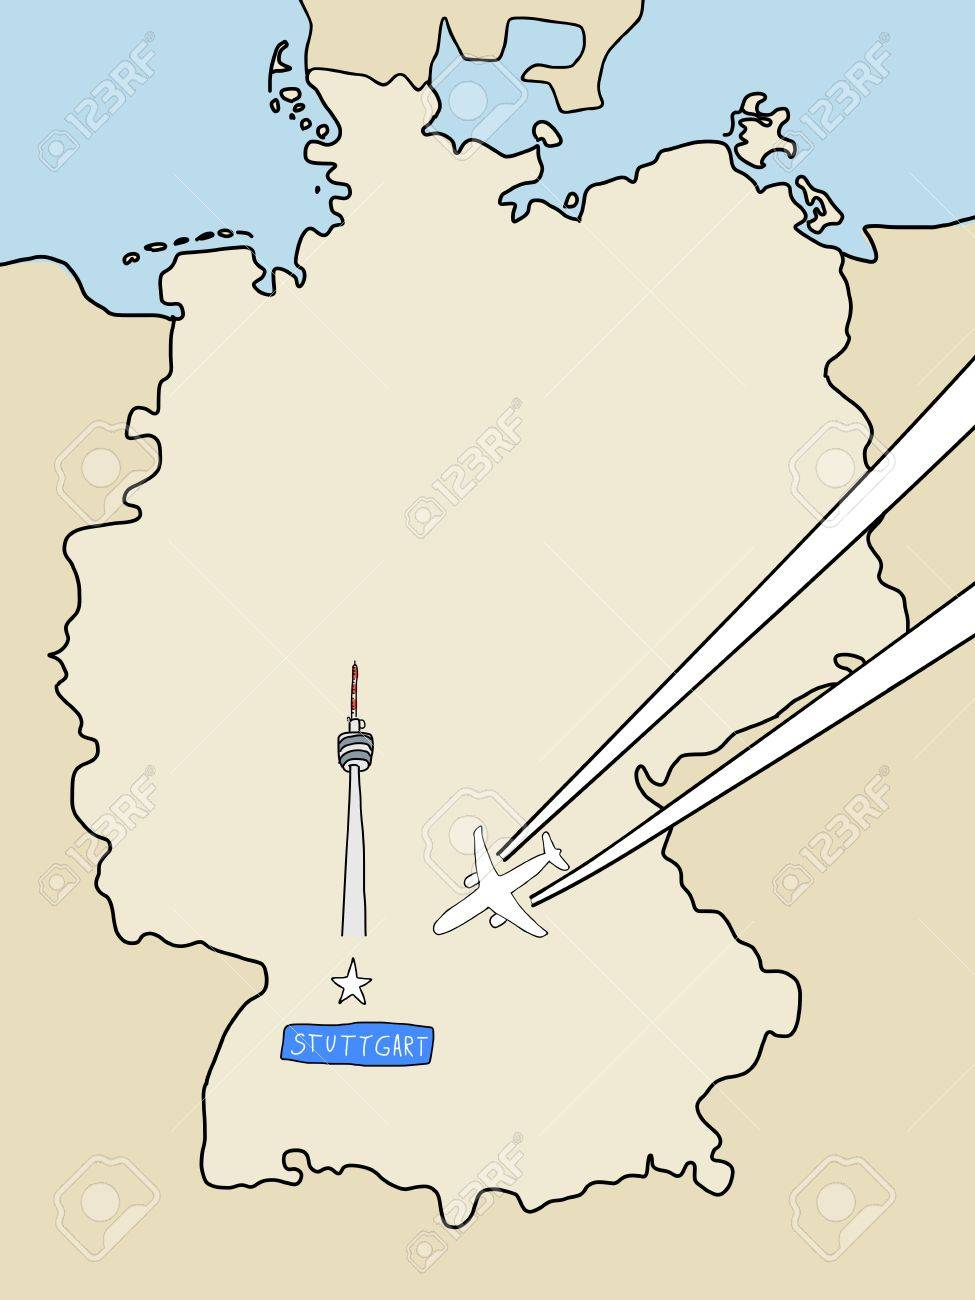 Cartina Germania Stoccarda.Vettoriale Visita Stoccarda Cartina Muta Della Germania E Un